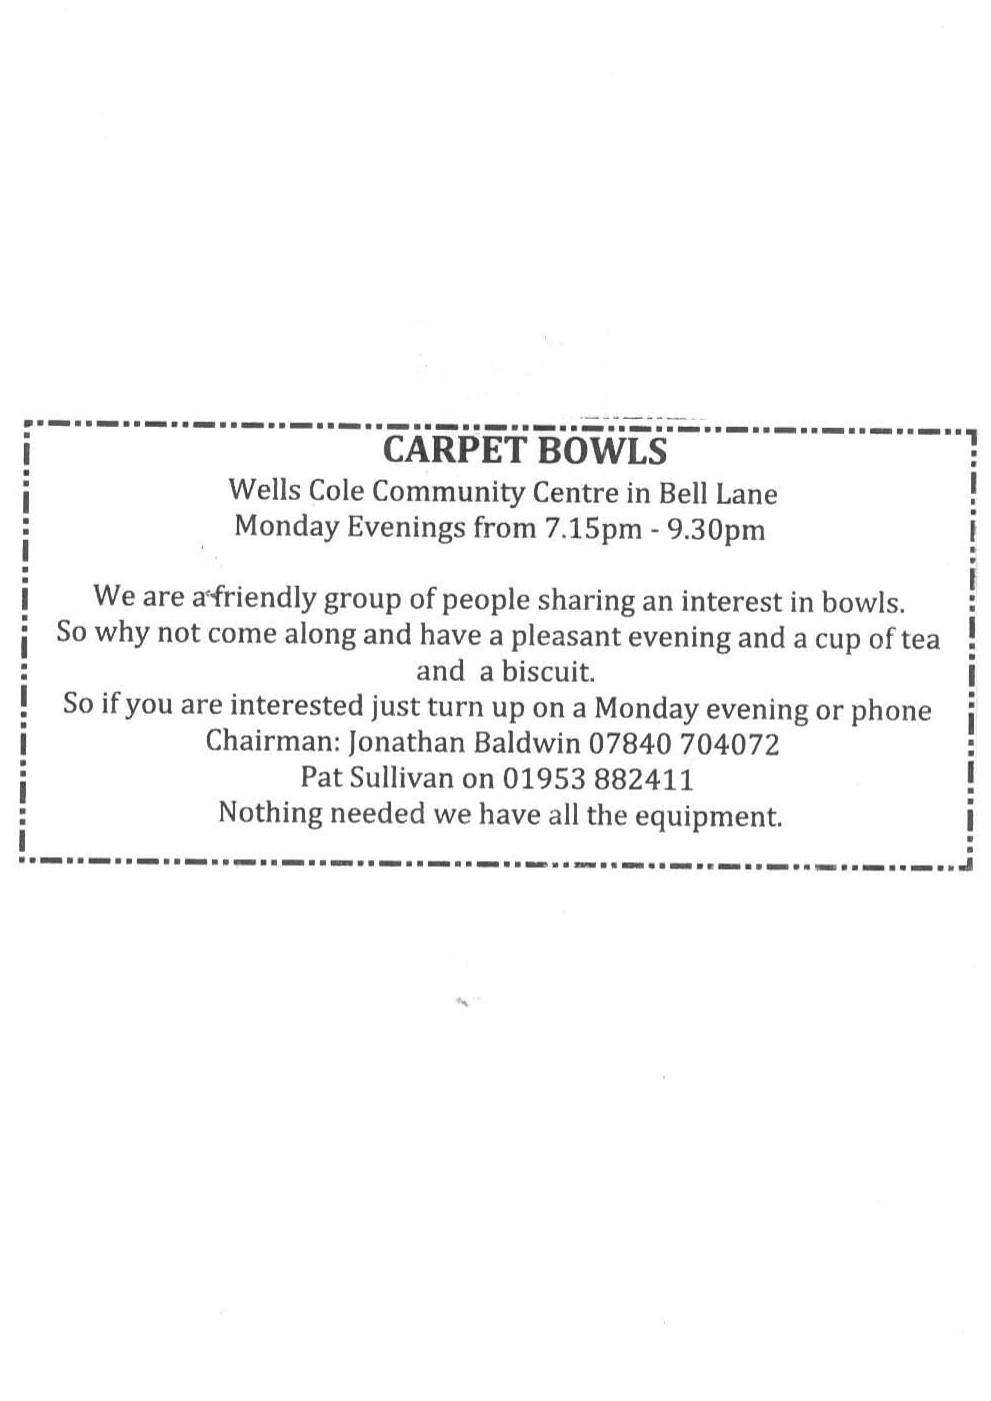 Carpet bowls @ Main Hall